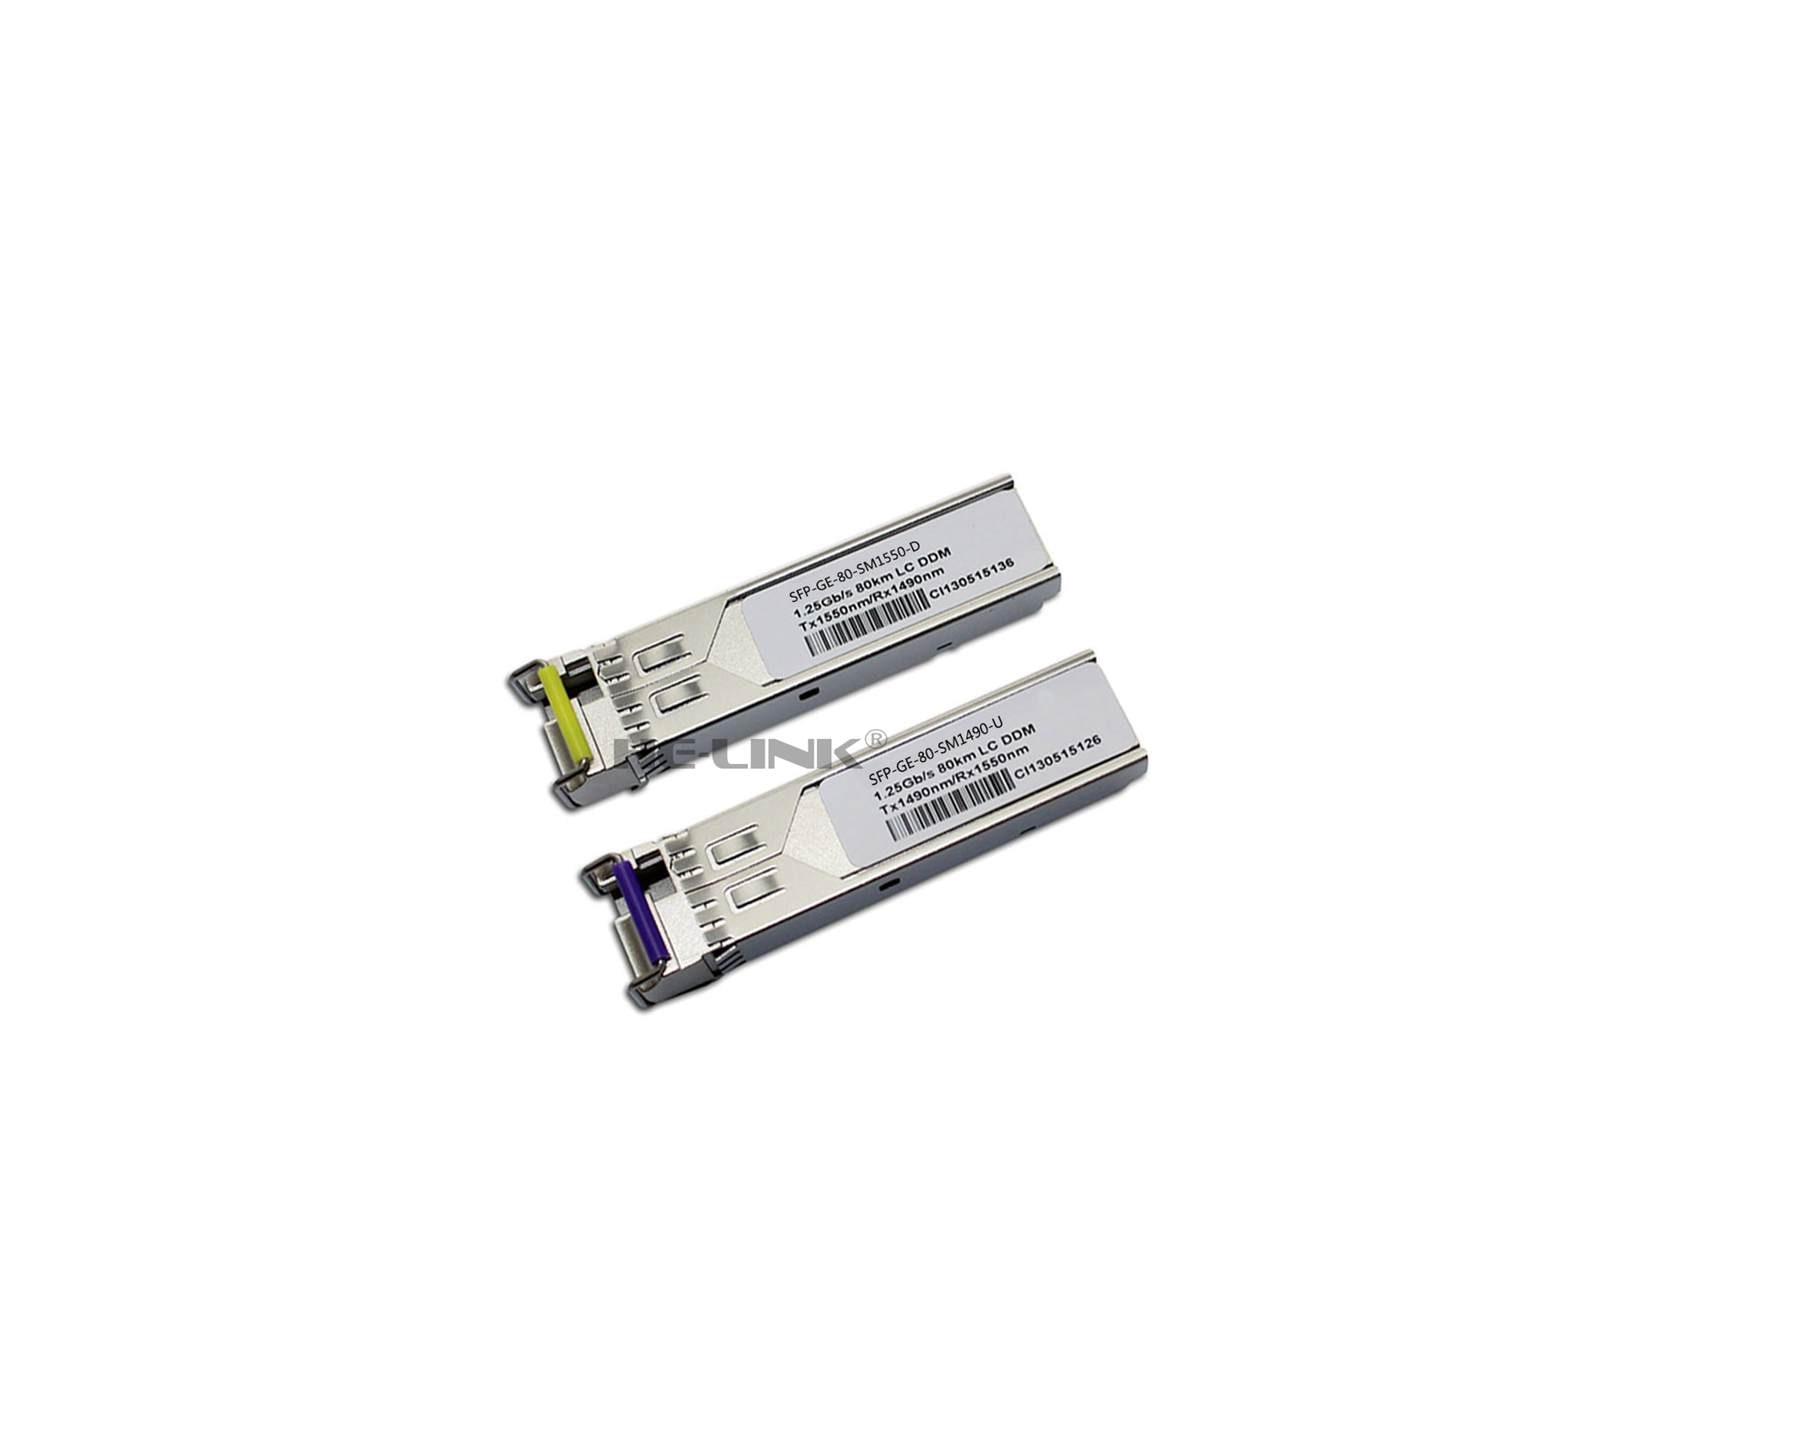 Lodfiber Sfp-ge-80-sm1490-u/sfp-ge-80-sm1550-d H-ua-wei Compatible 1.25g 1490/1550nm Bidi 80km Transceiver Cellphones & Telecommunications